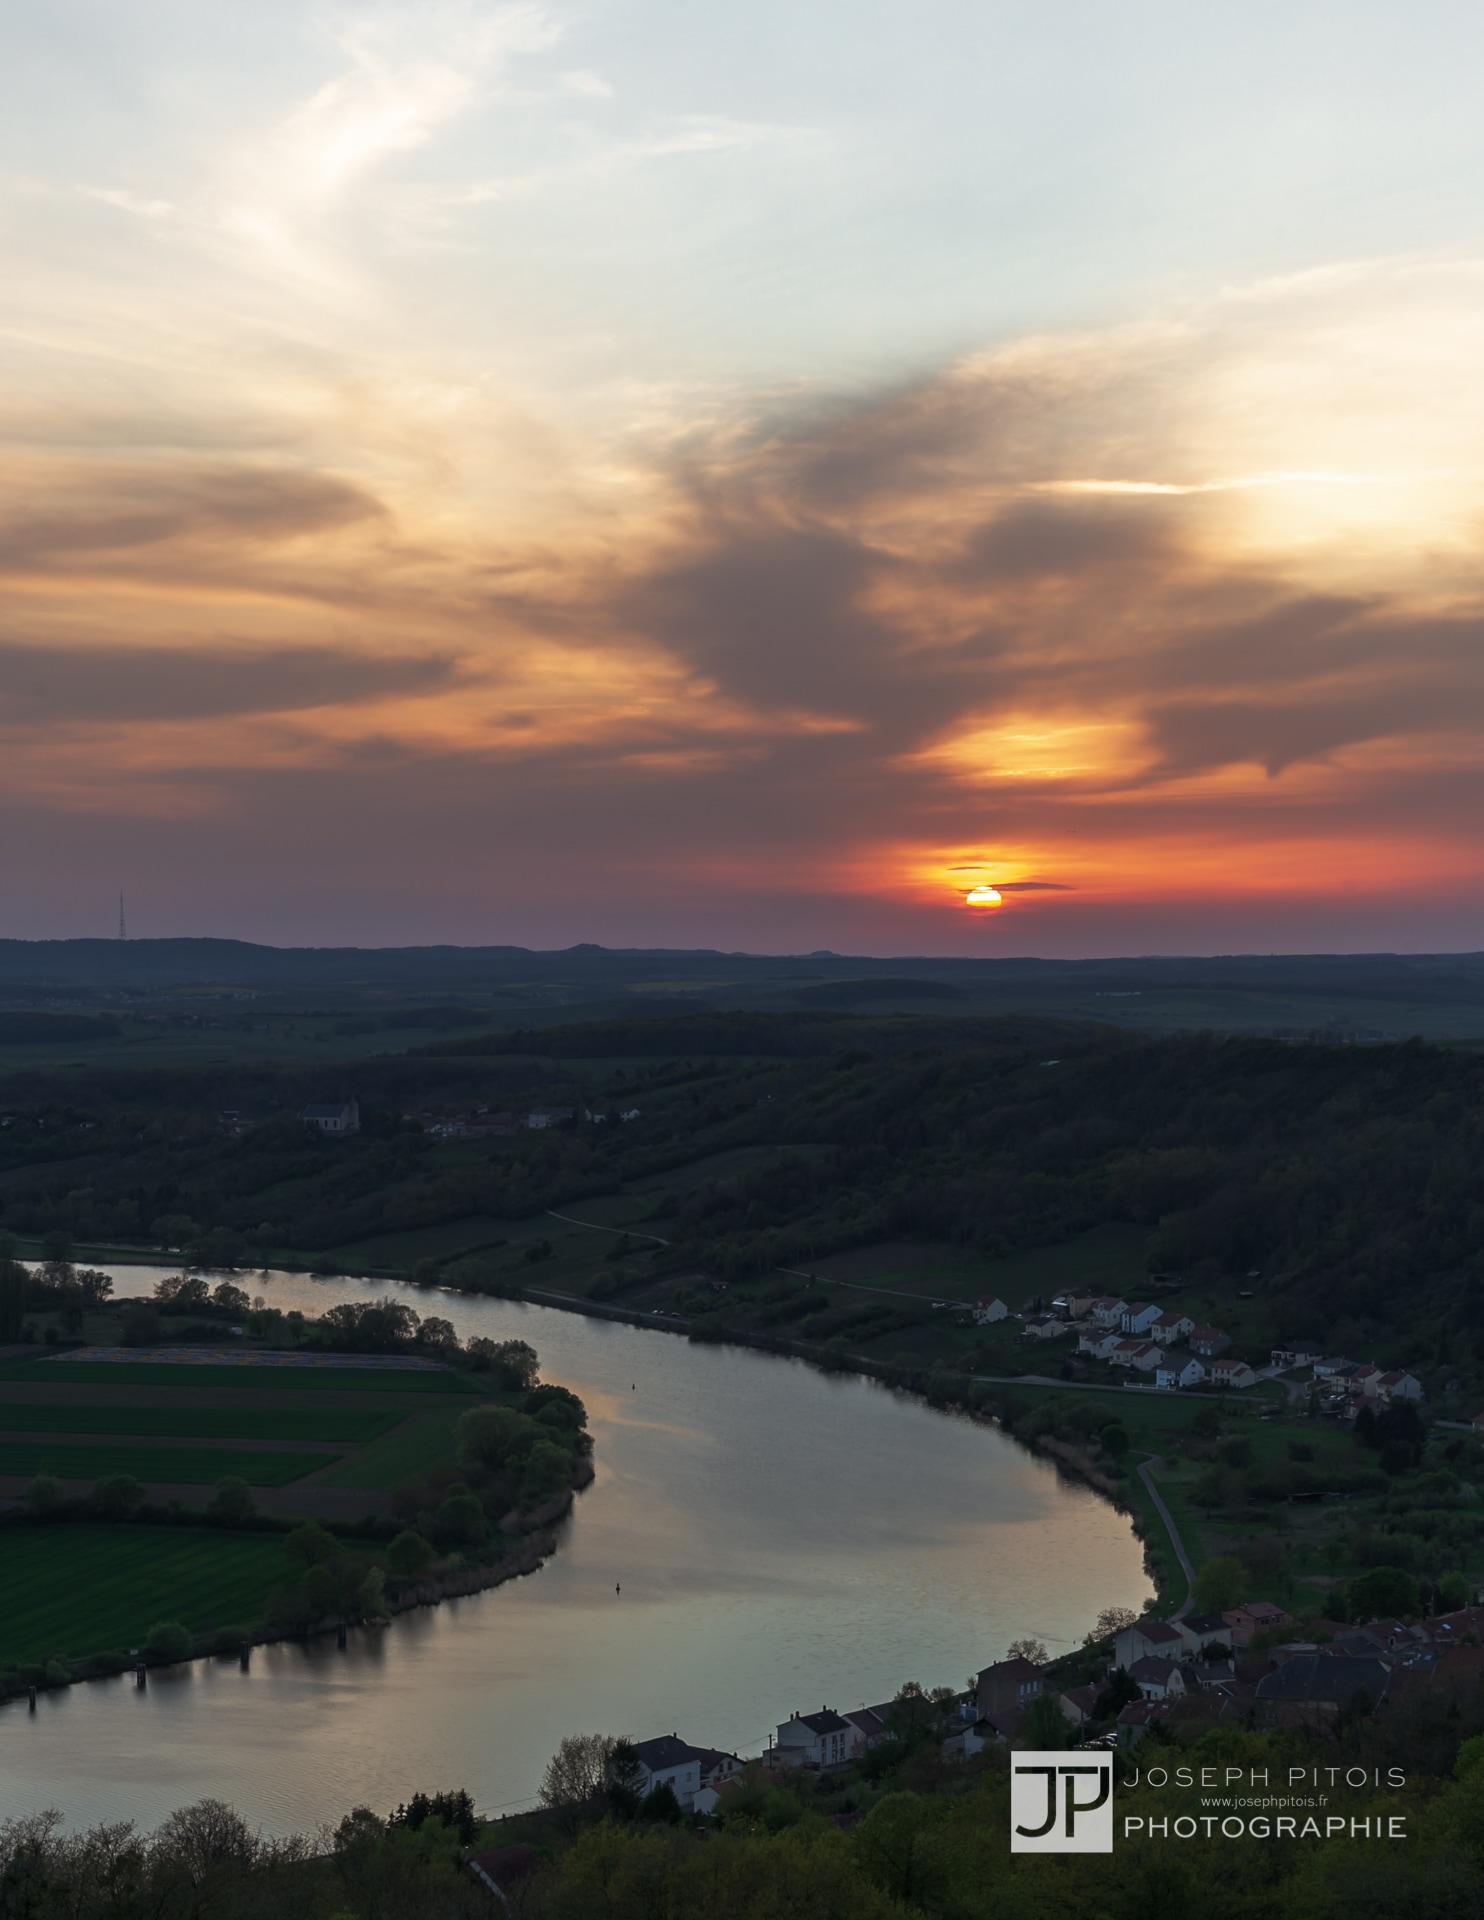 coucher-de-soleil-nature-stromberg-IMG_7774